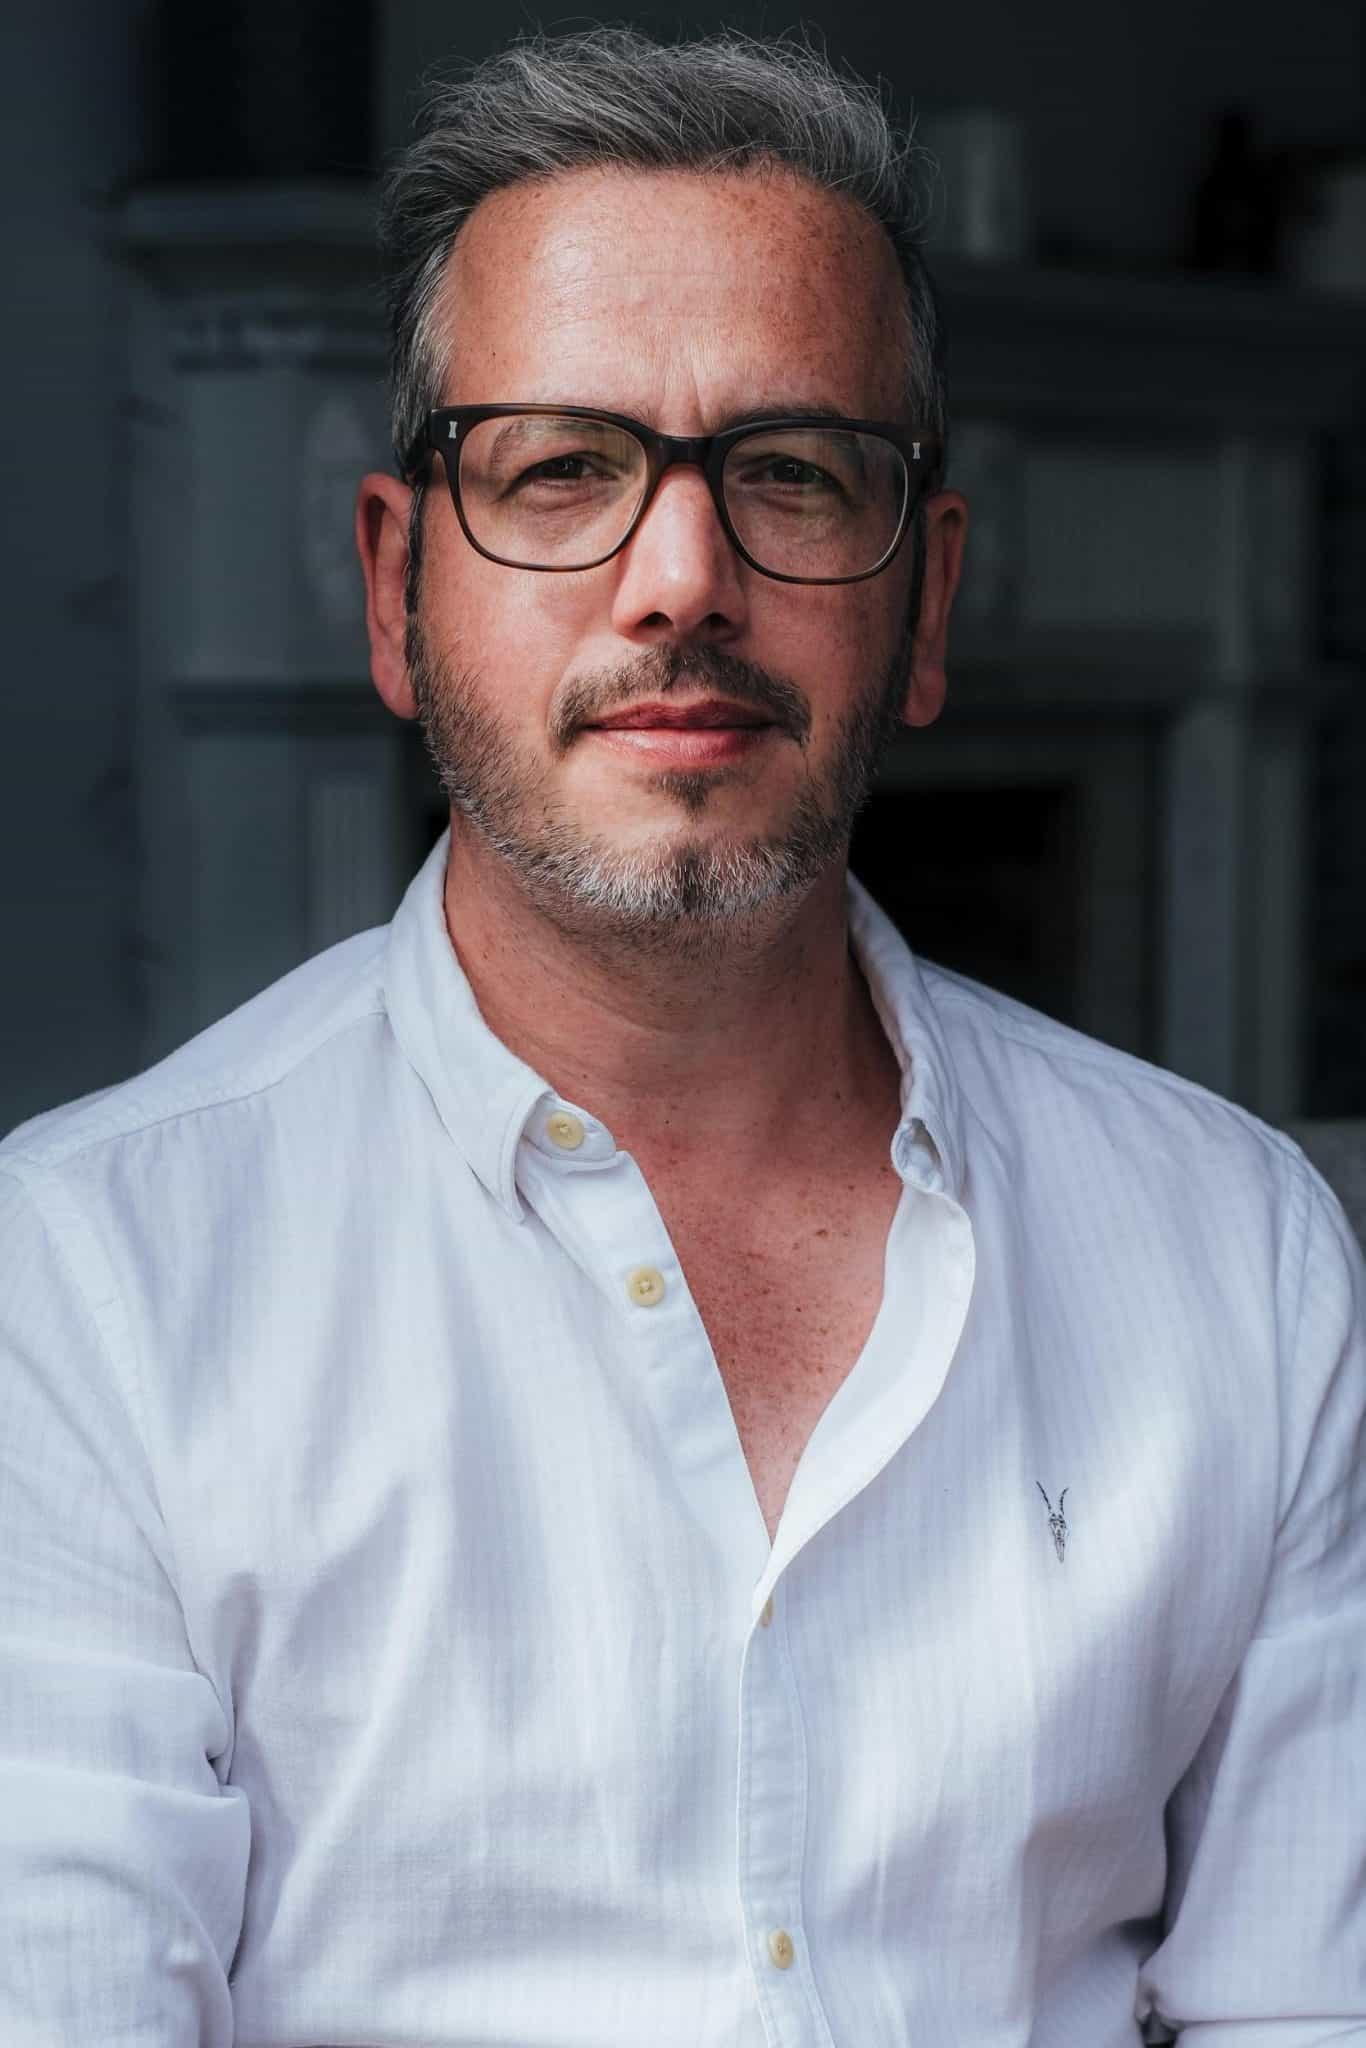 Playrcart CEO Glen Dormieux